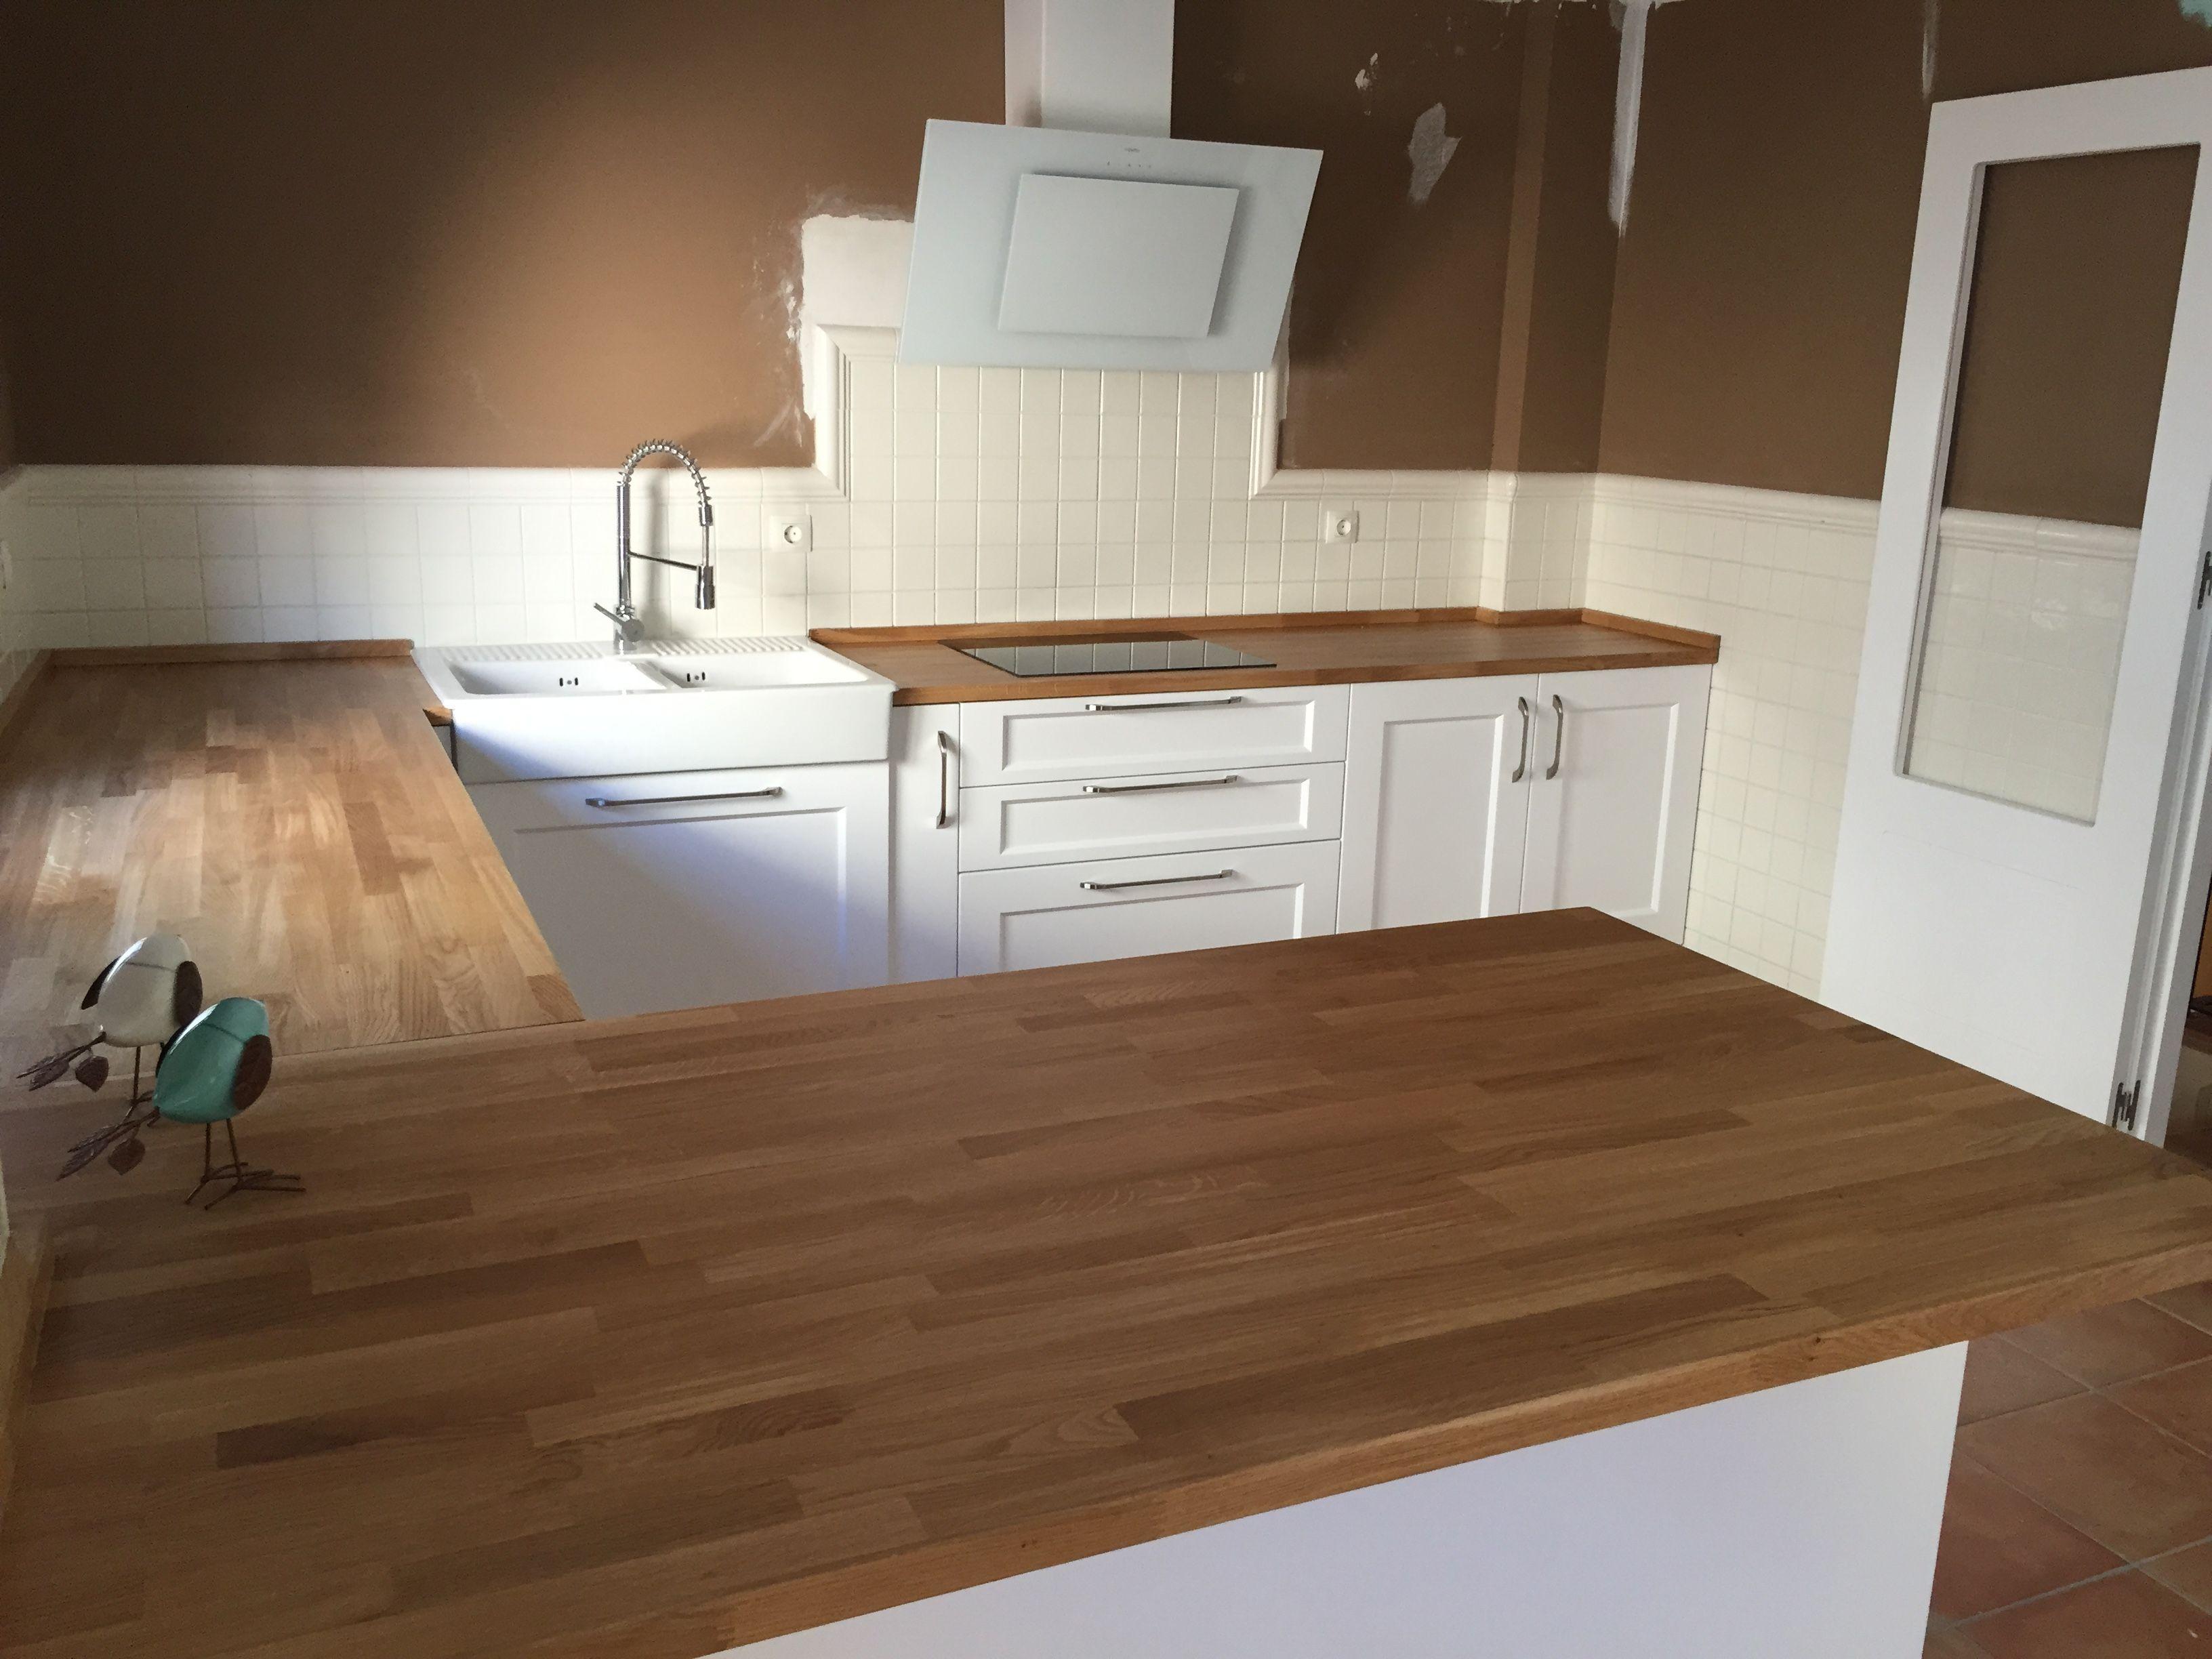 Cocina de diseño nórdico (Escandinavo). #Puertas lacadas blanco mate ...